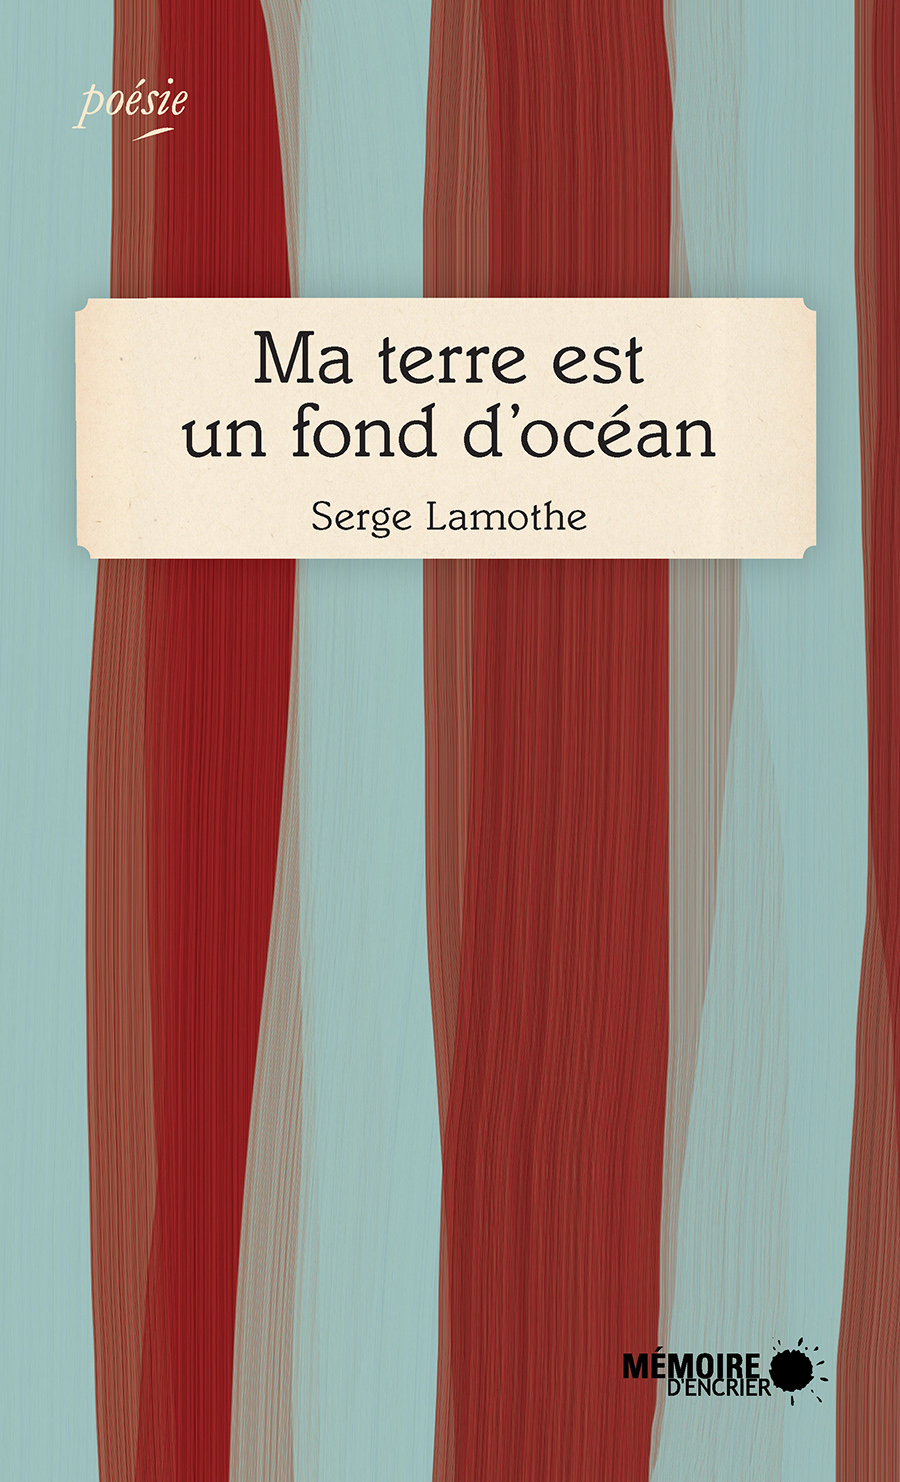 Ma terre est un fond d'océan